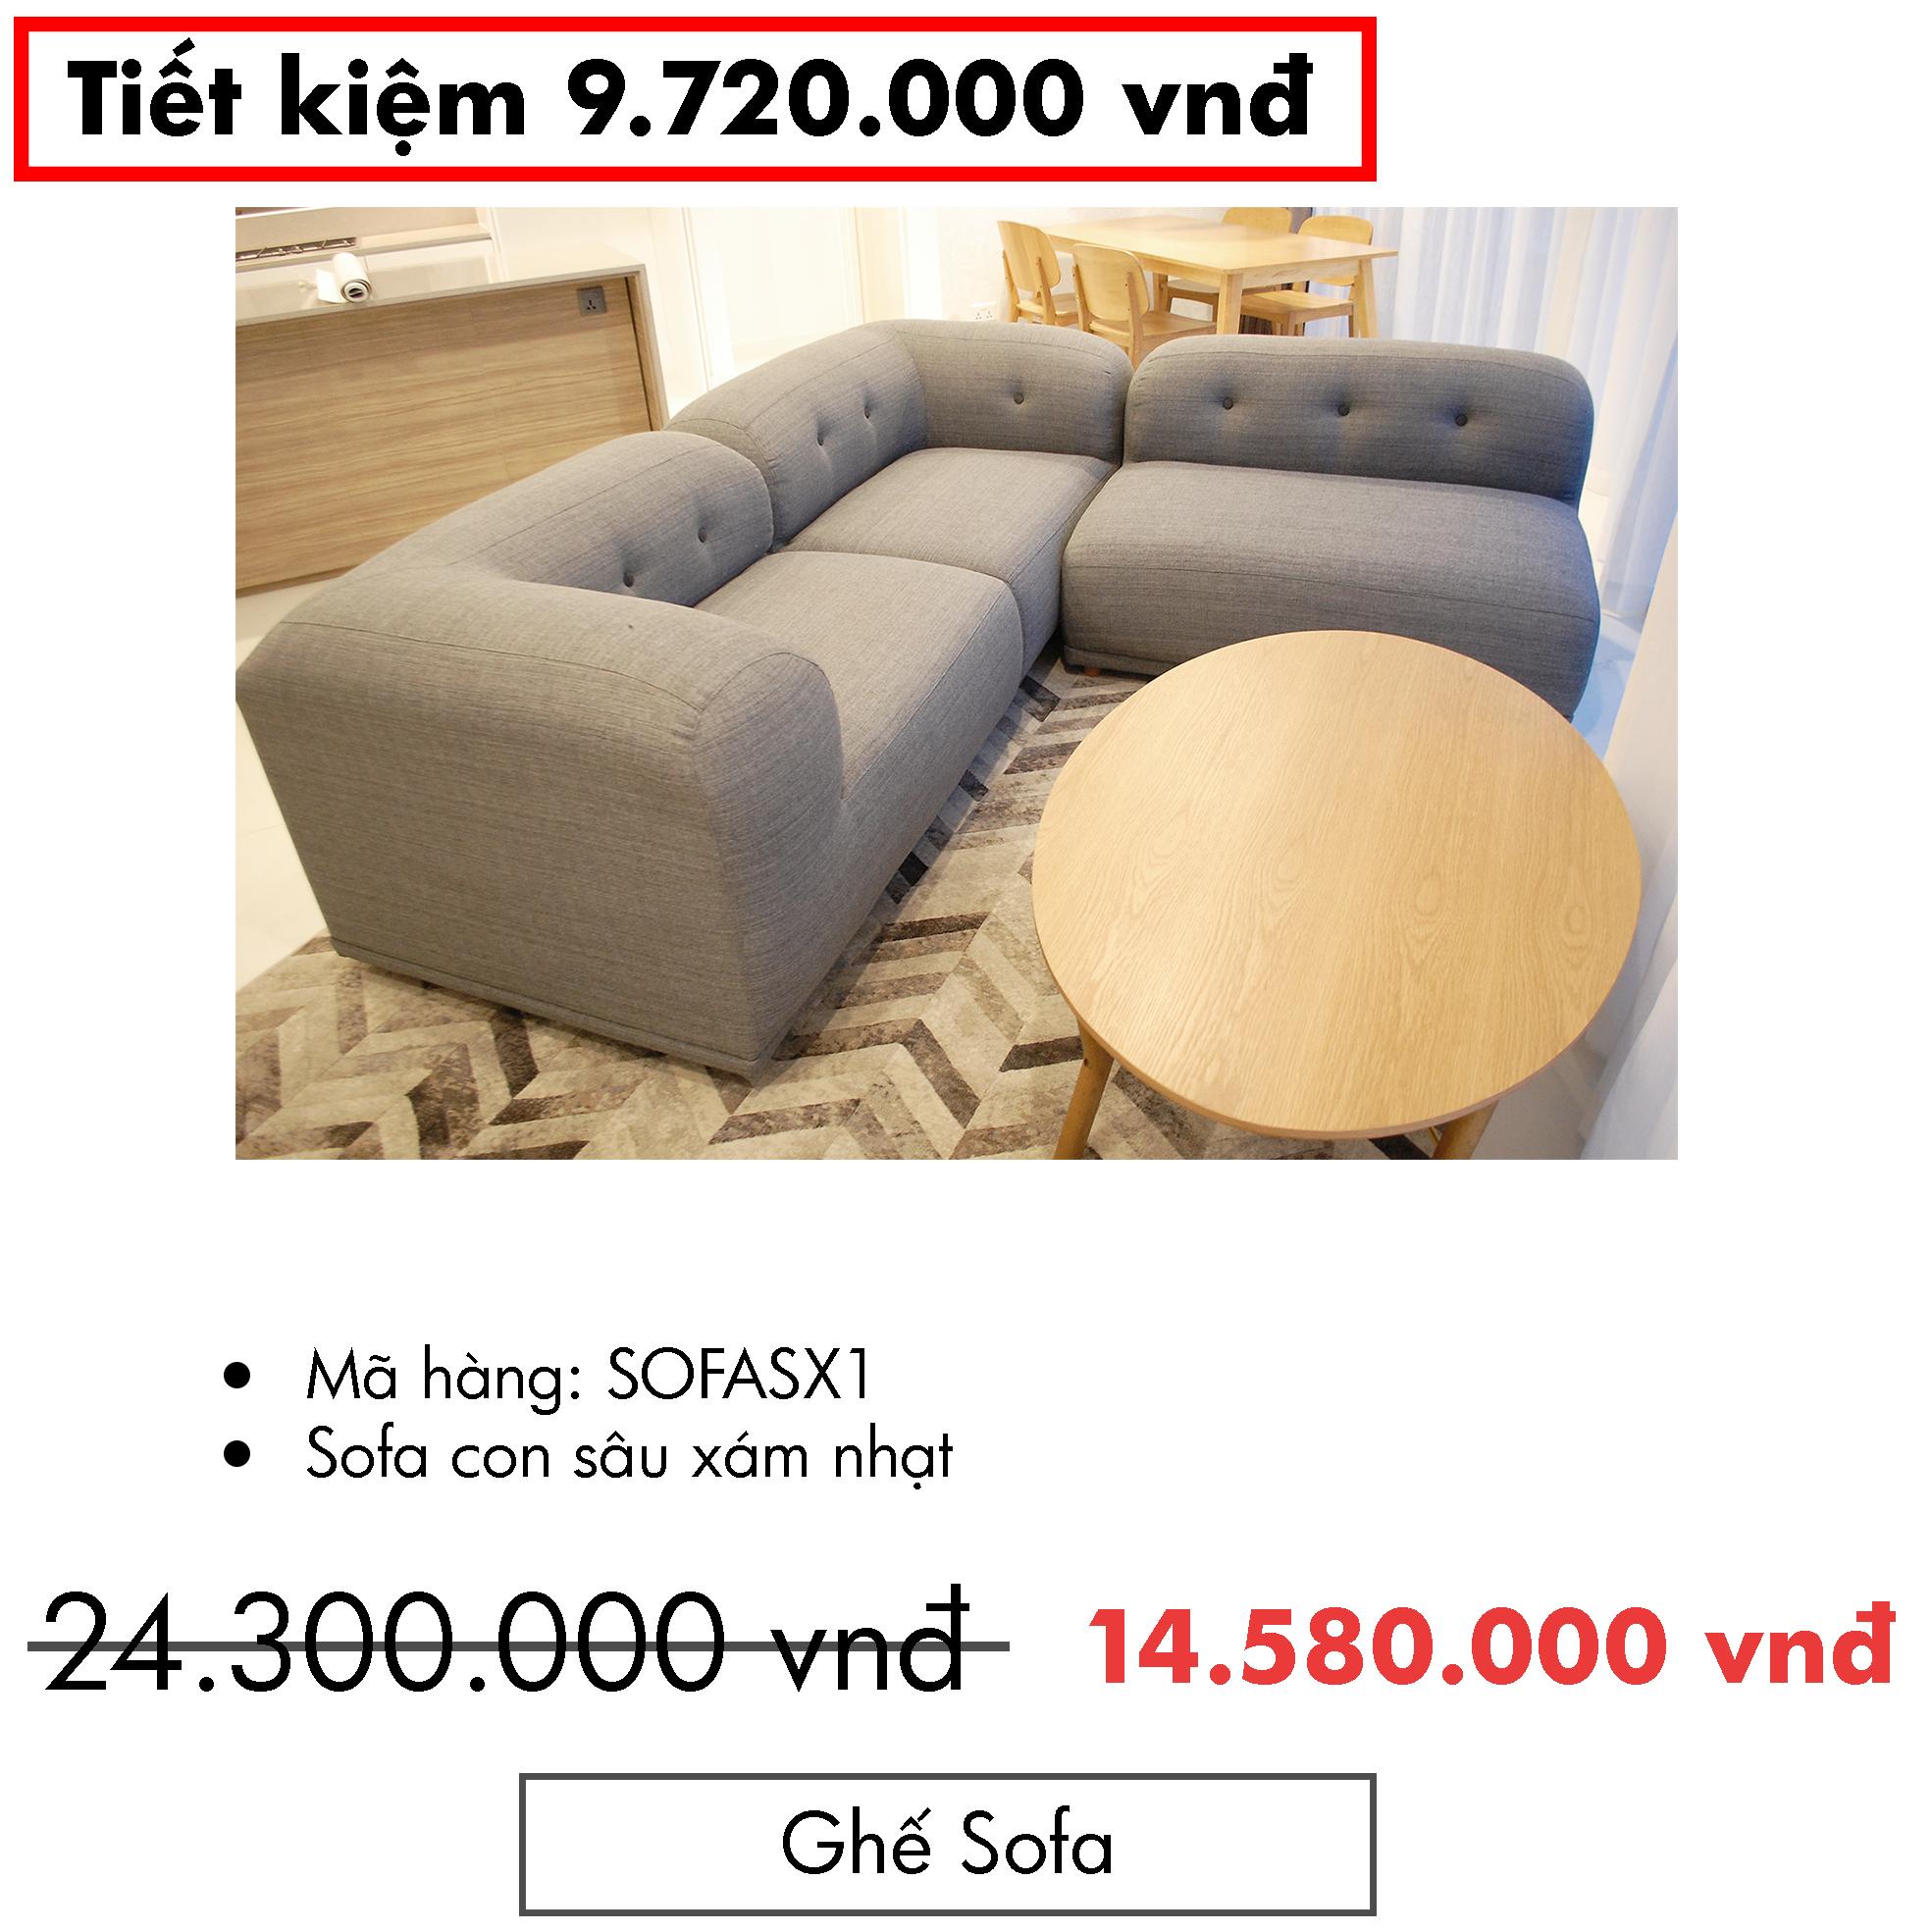 Ghế_sofa_11.png